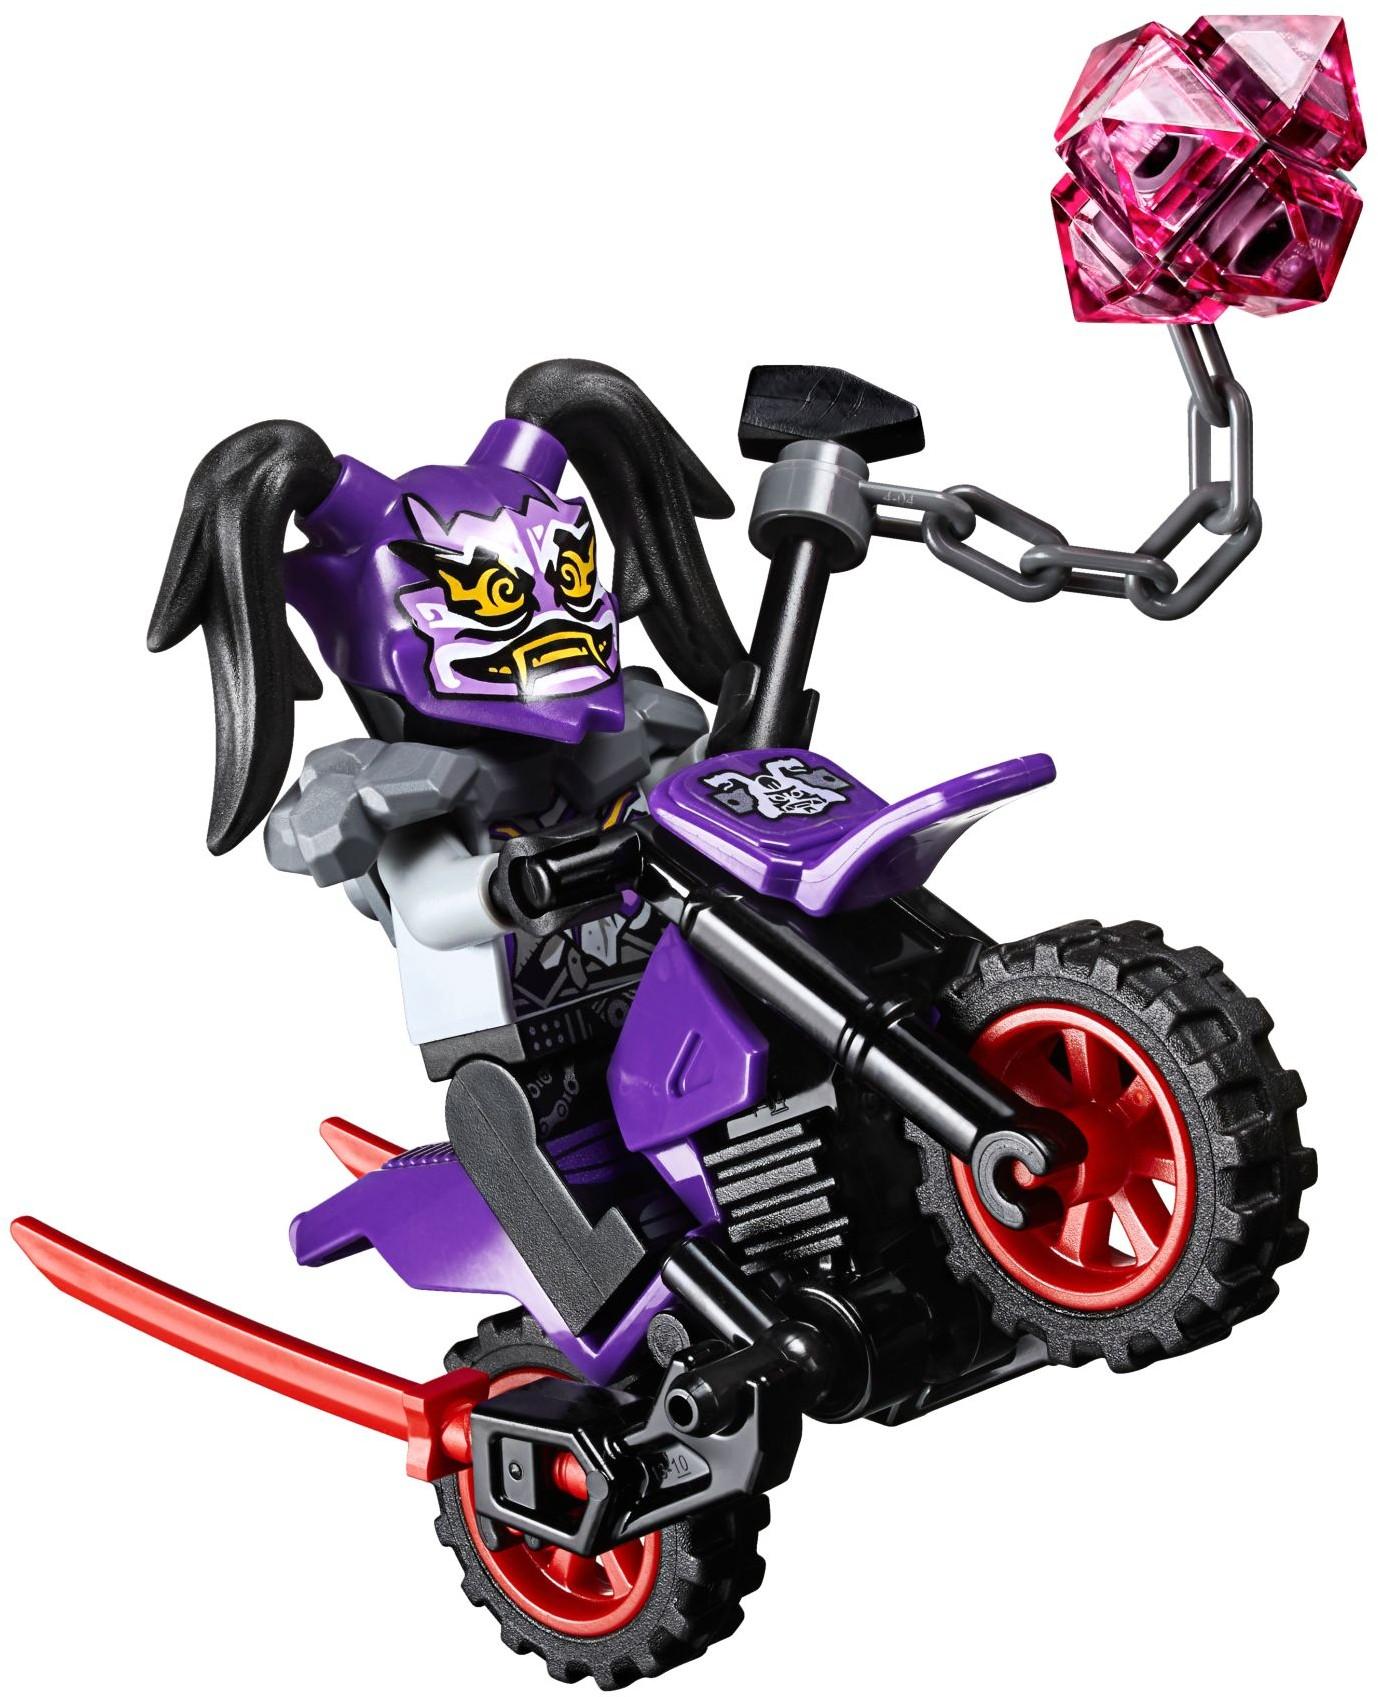 Spielzeug LEGO Ninjago Minifigur Ultra Violet mit Oni Maske Waffen und  Motorrad aus 70641 triadecont.com.br